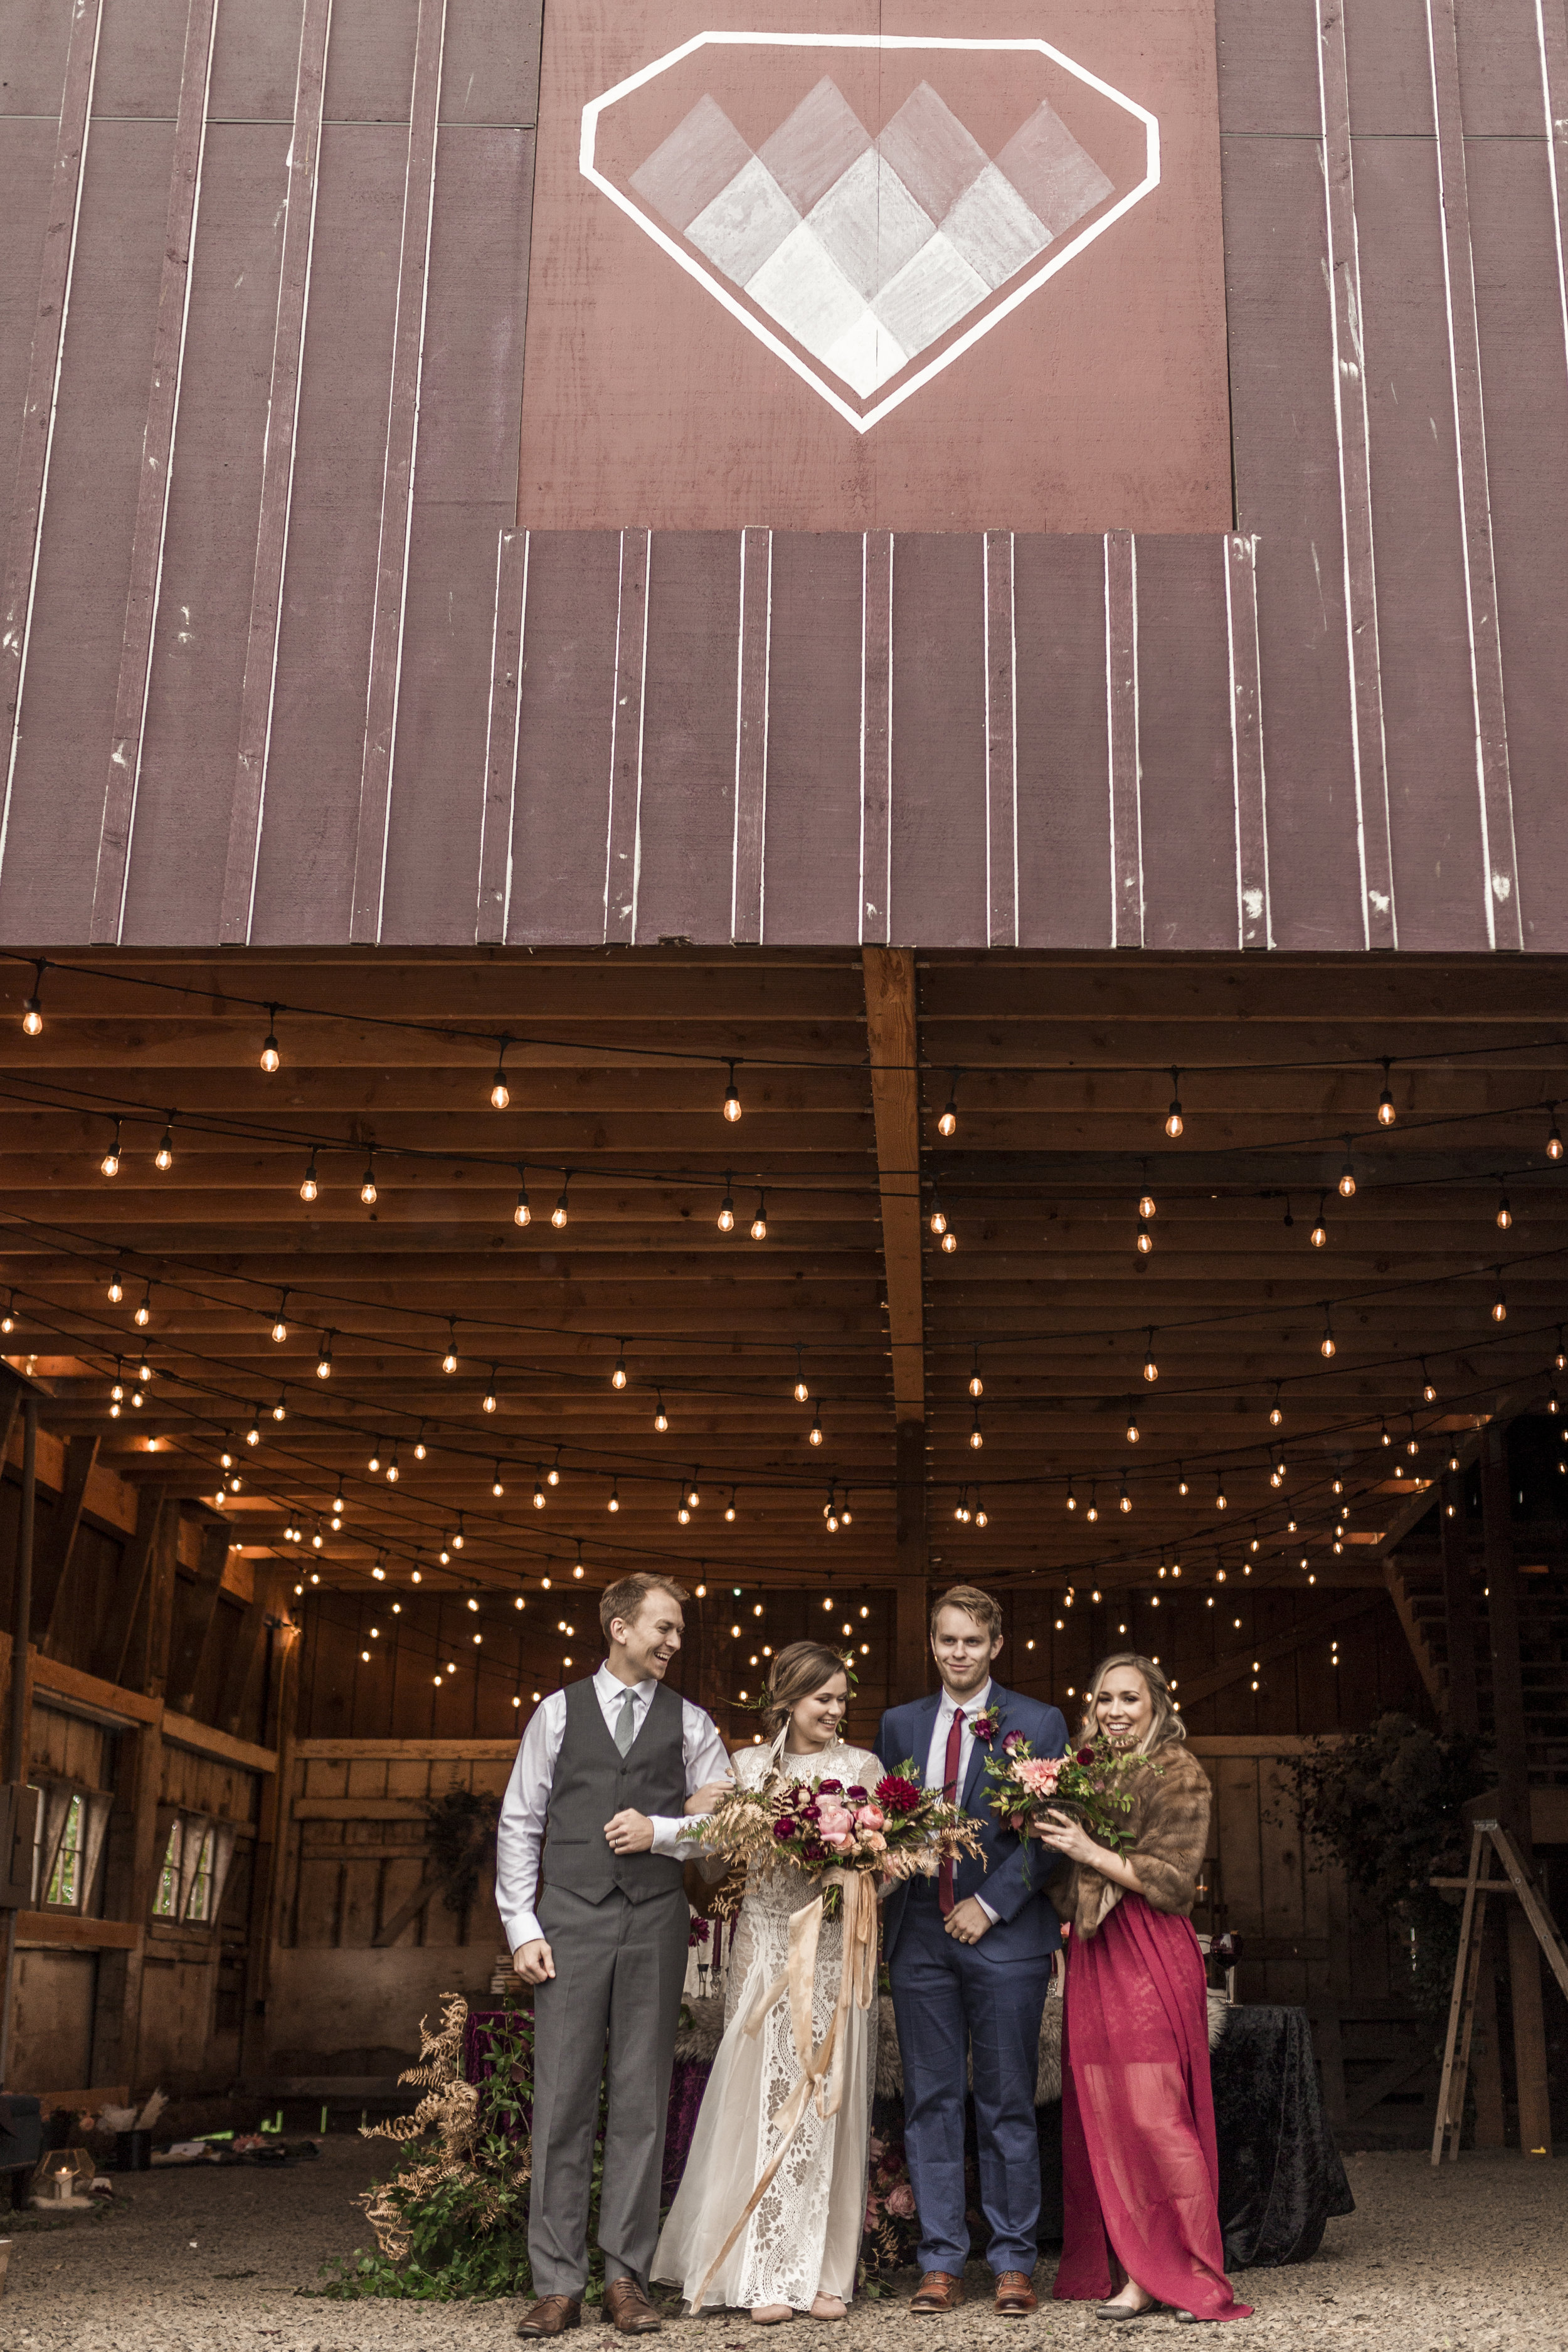 PNW Elopement | Forest Grove, Oregon | Bri Bergman Photography 025.JPG